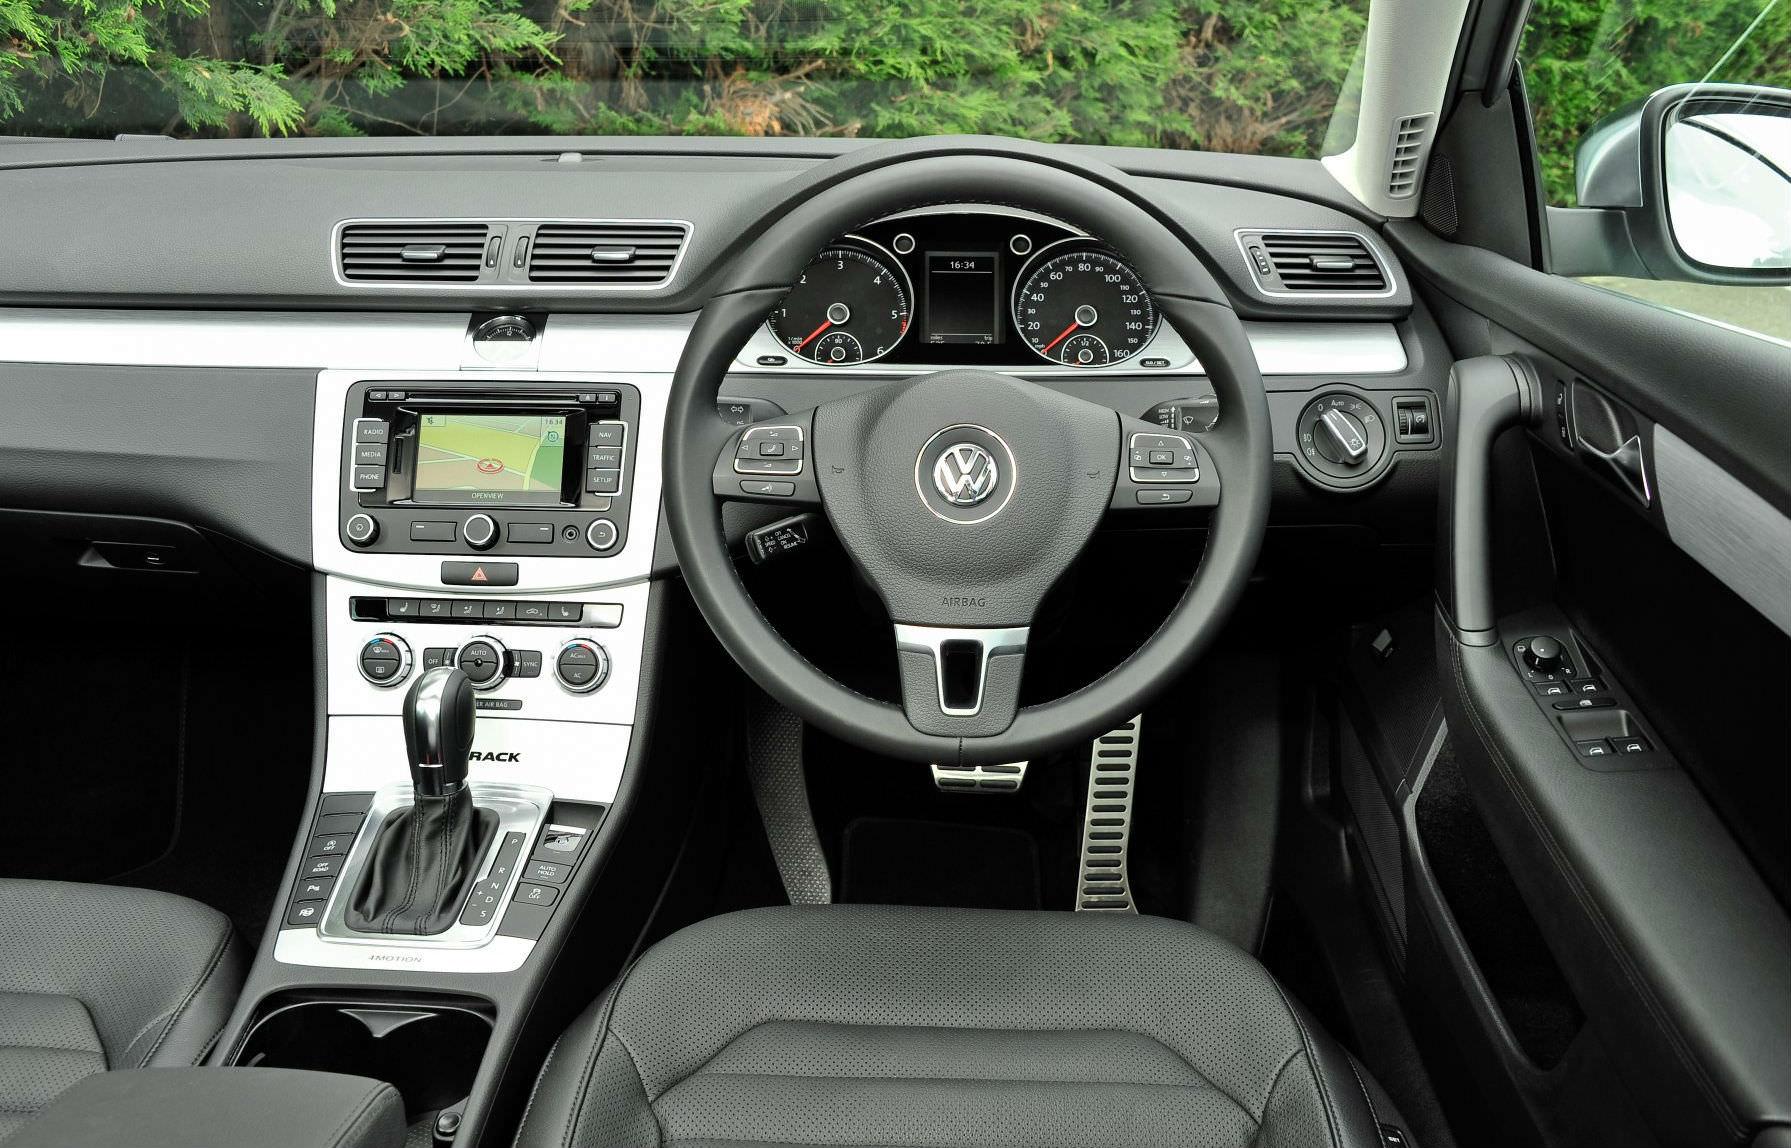 image of a volkswagen passat alltrack car interior